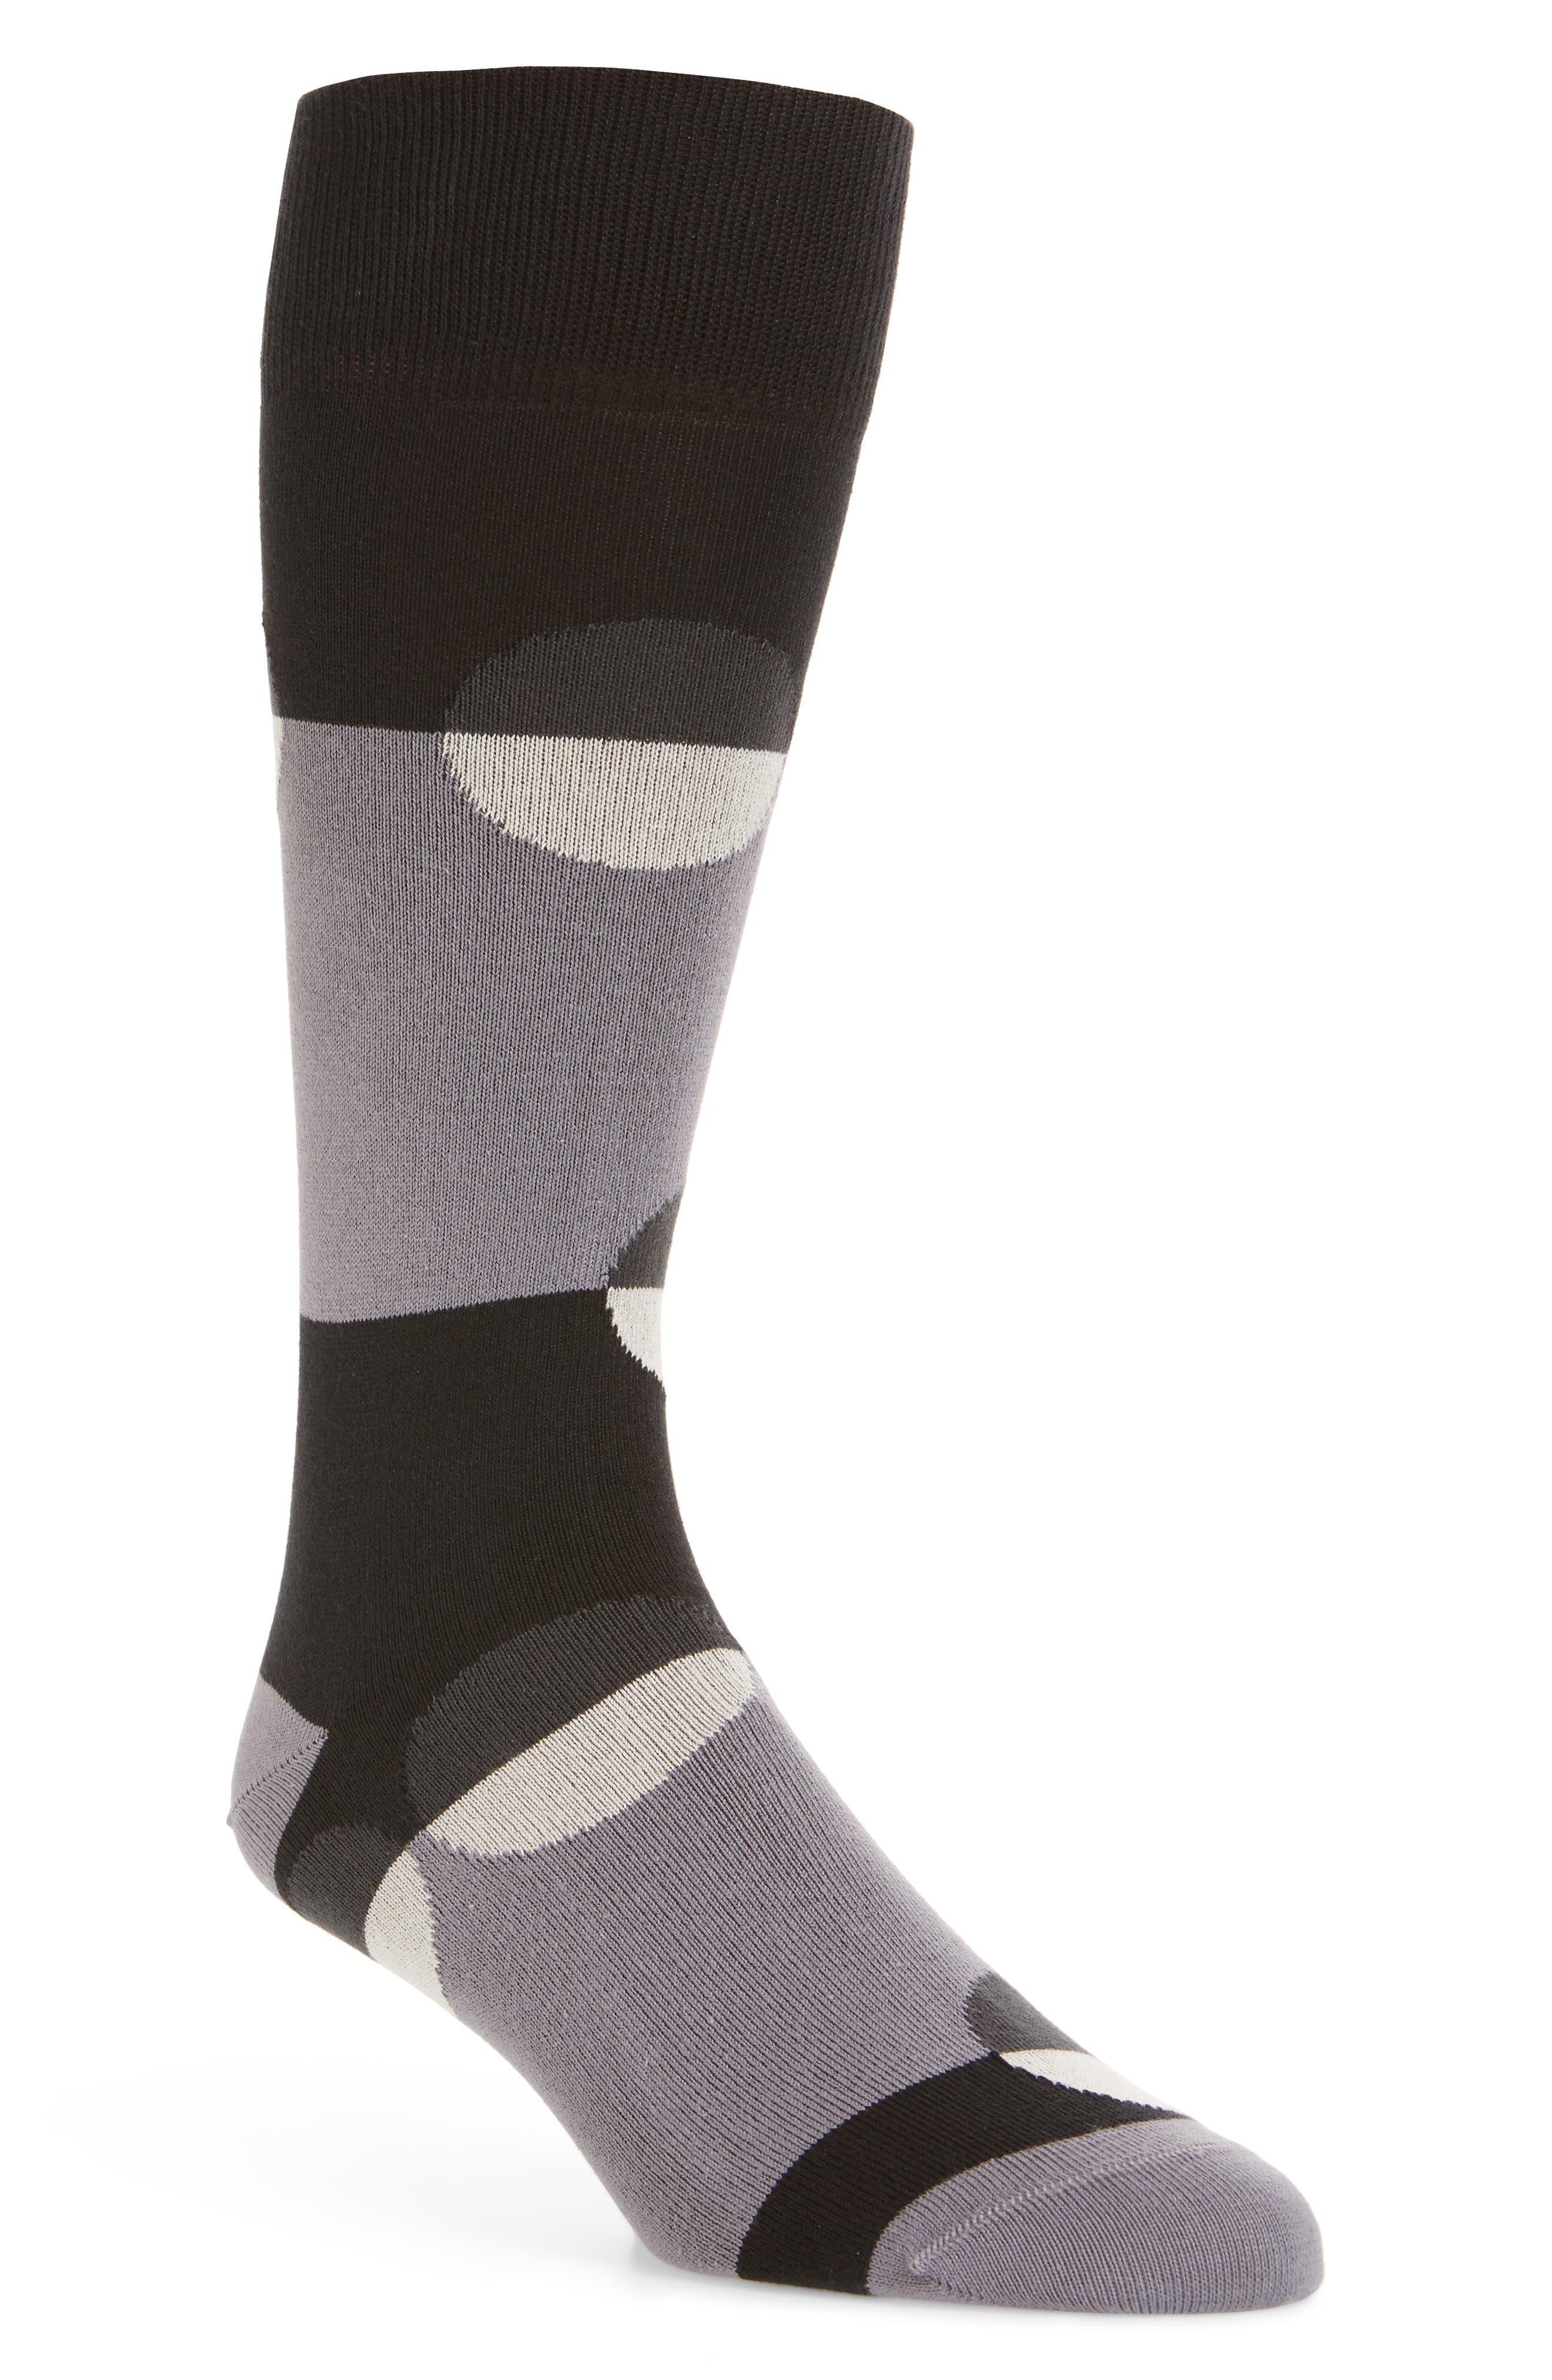 Paul Smith Crescent Dot Socks